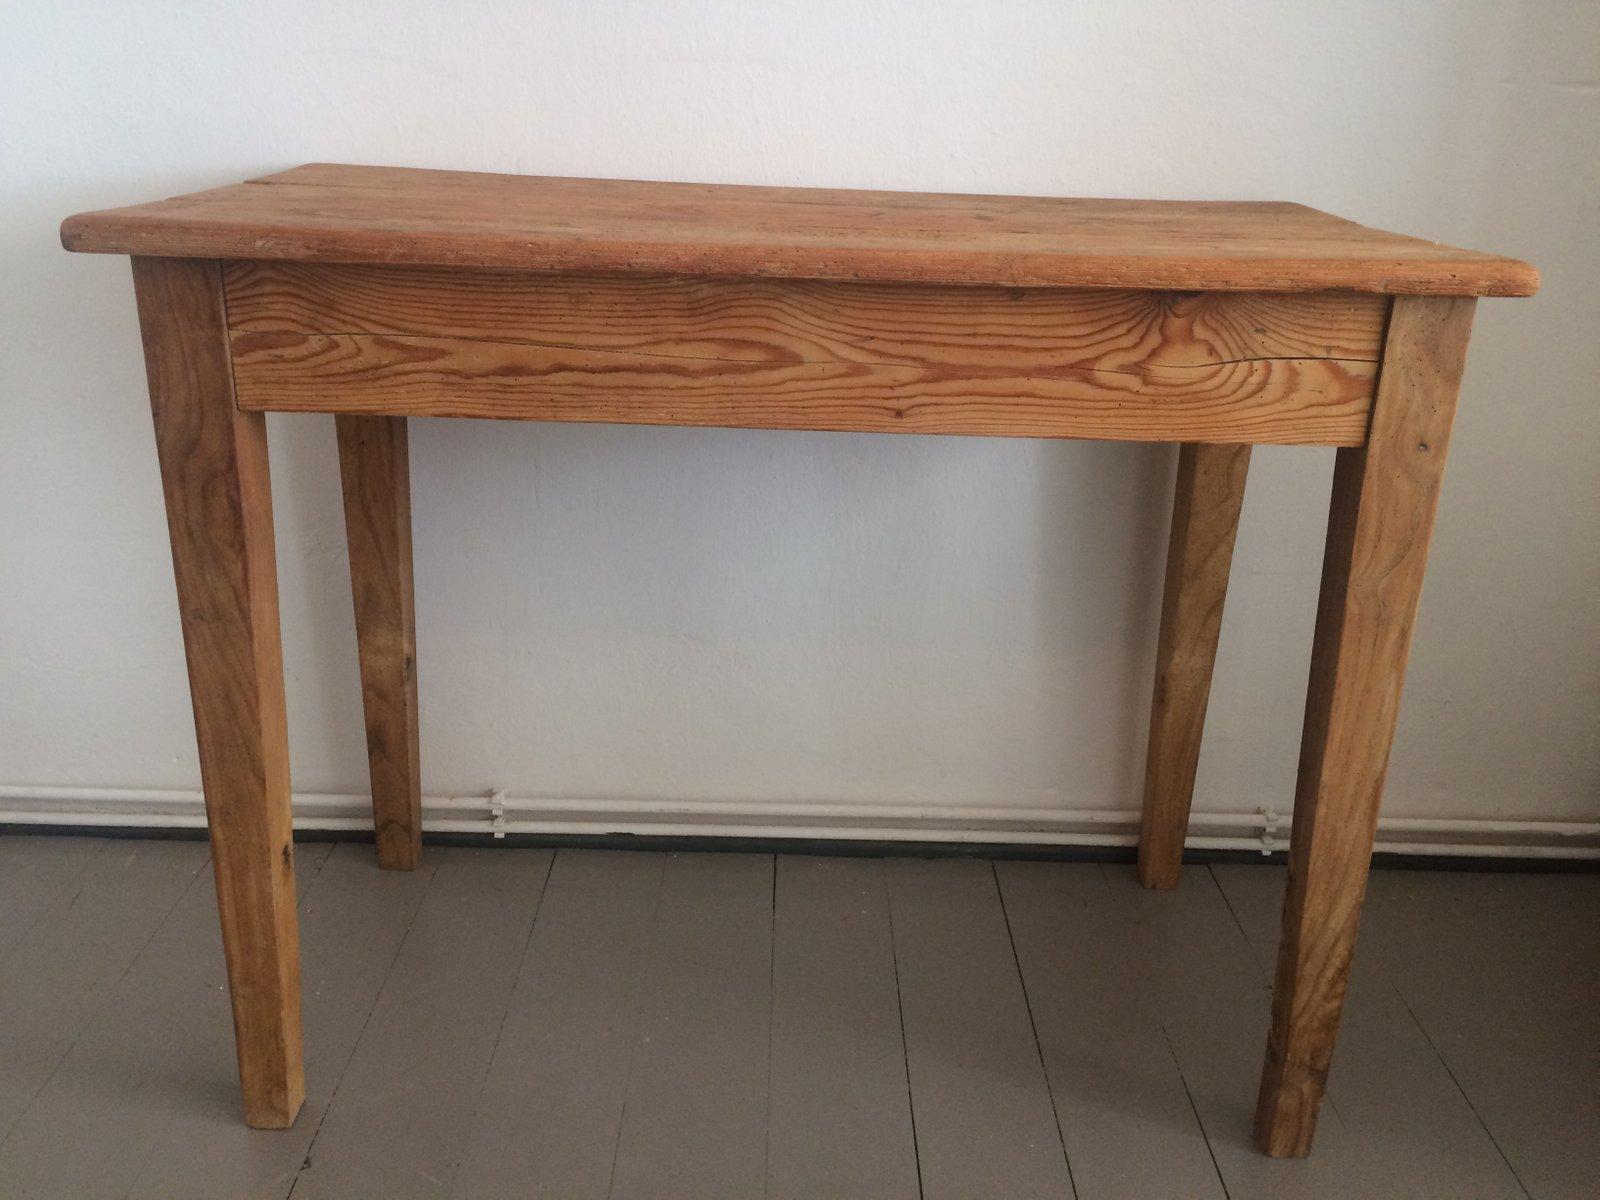 Best tavolo antico in legno with tavolo antico - Tavolo antico sedie moderne ...